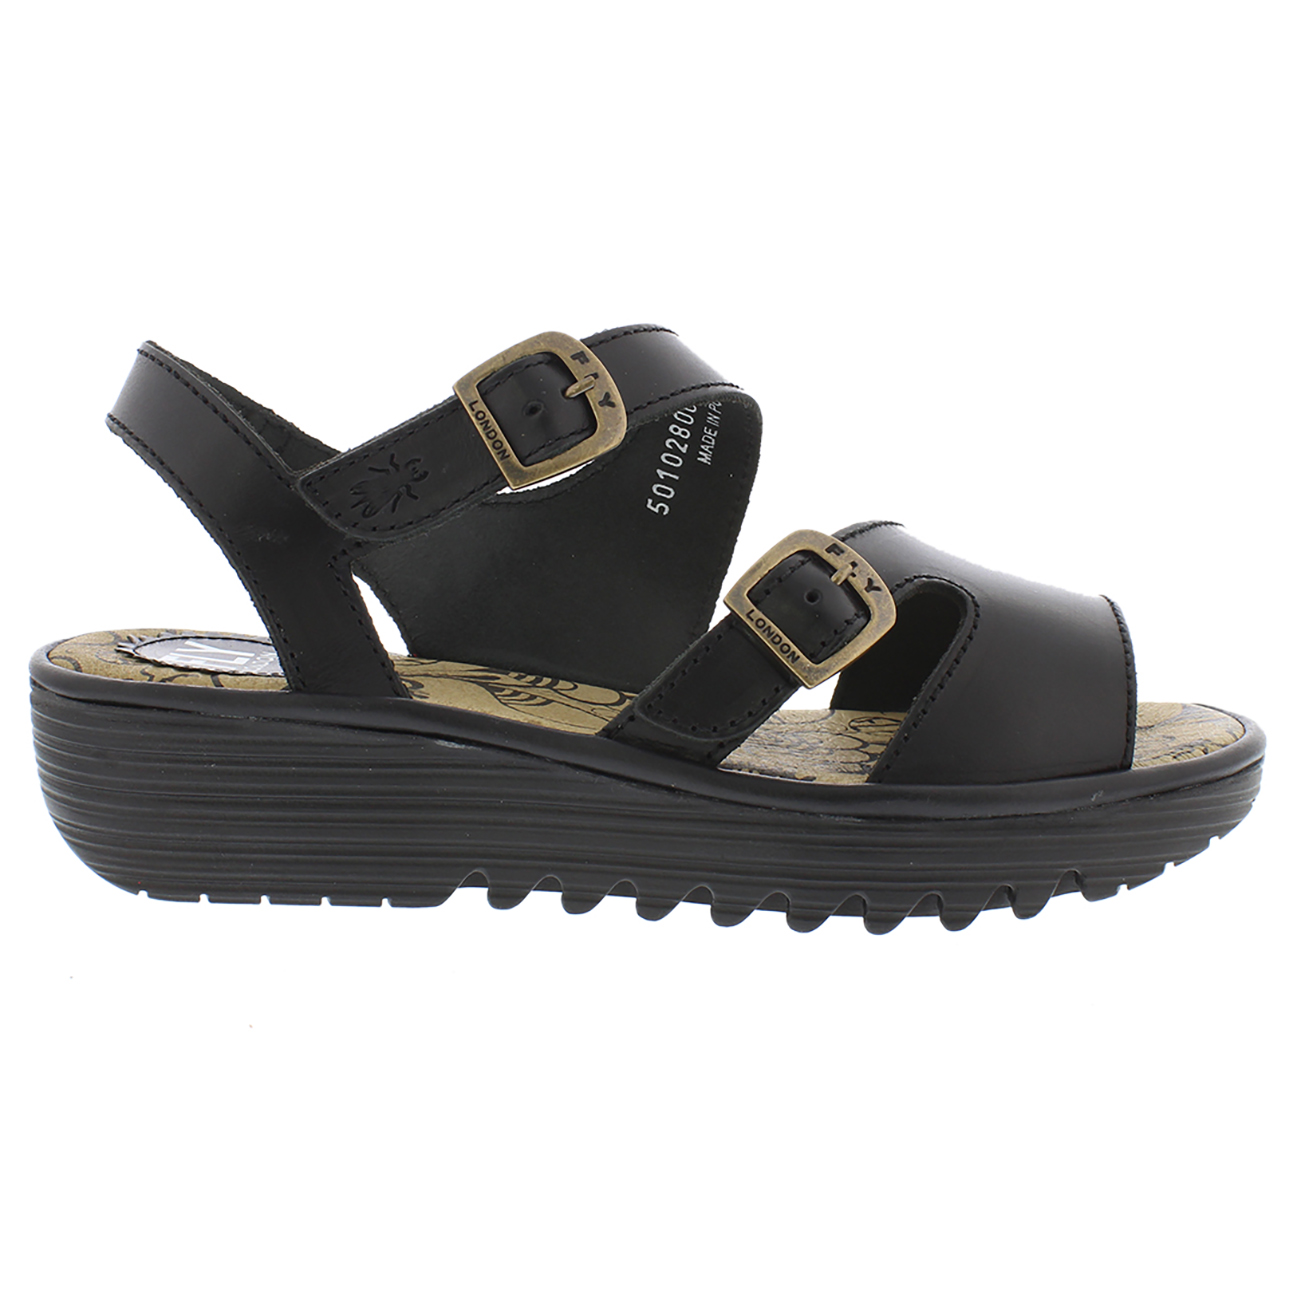 London Leather Womens Cut Open Fly Uk About Bridle Out Summer Sandals 3 9 Details Enat Toe shQrdt